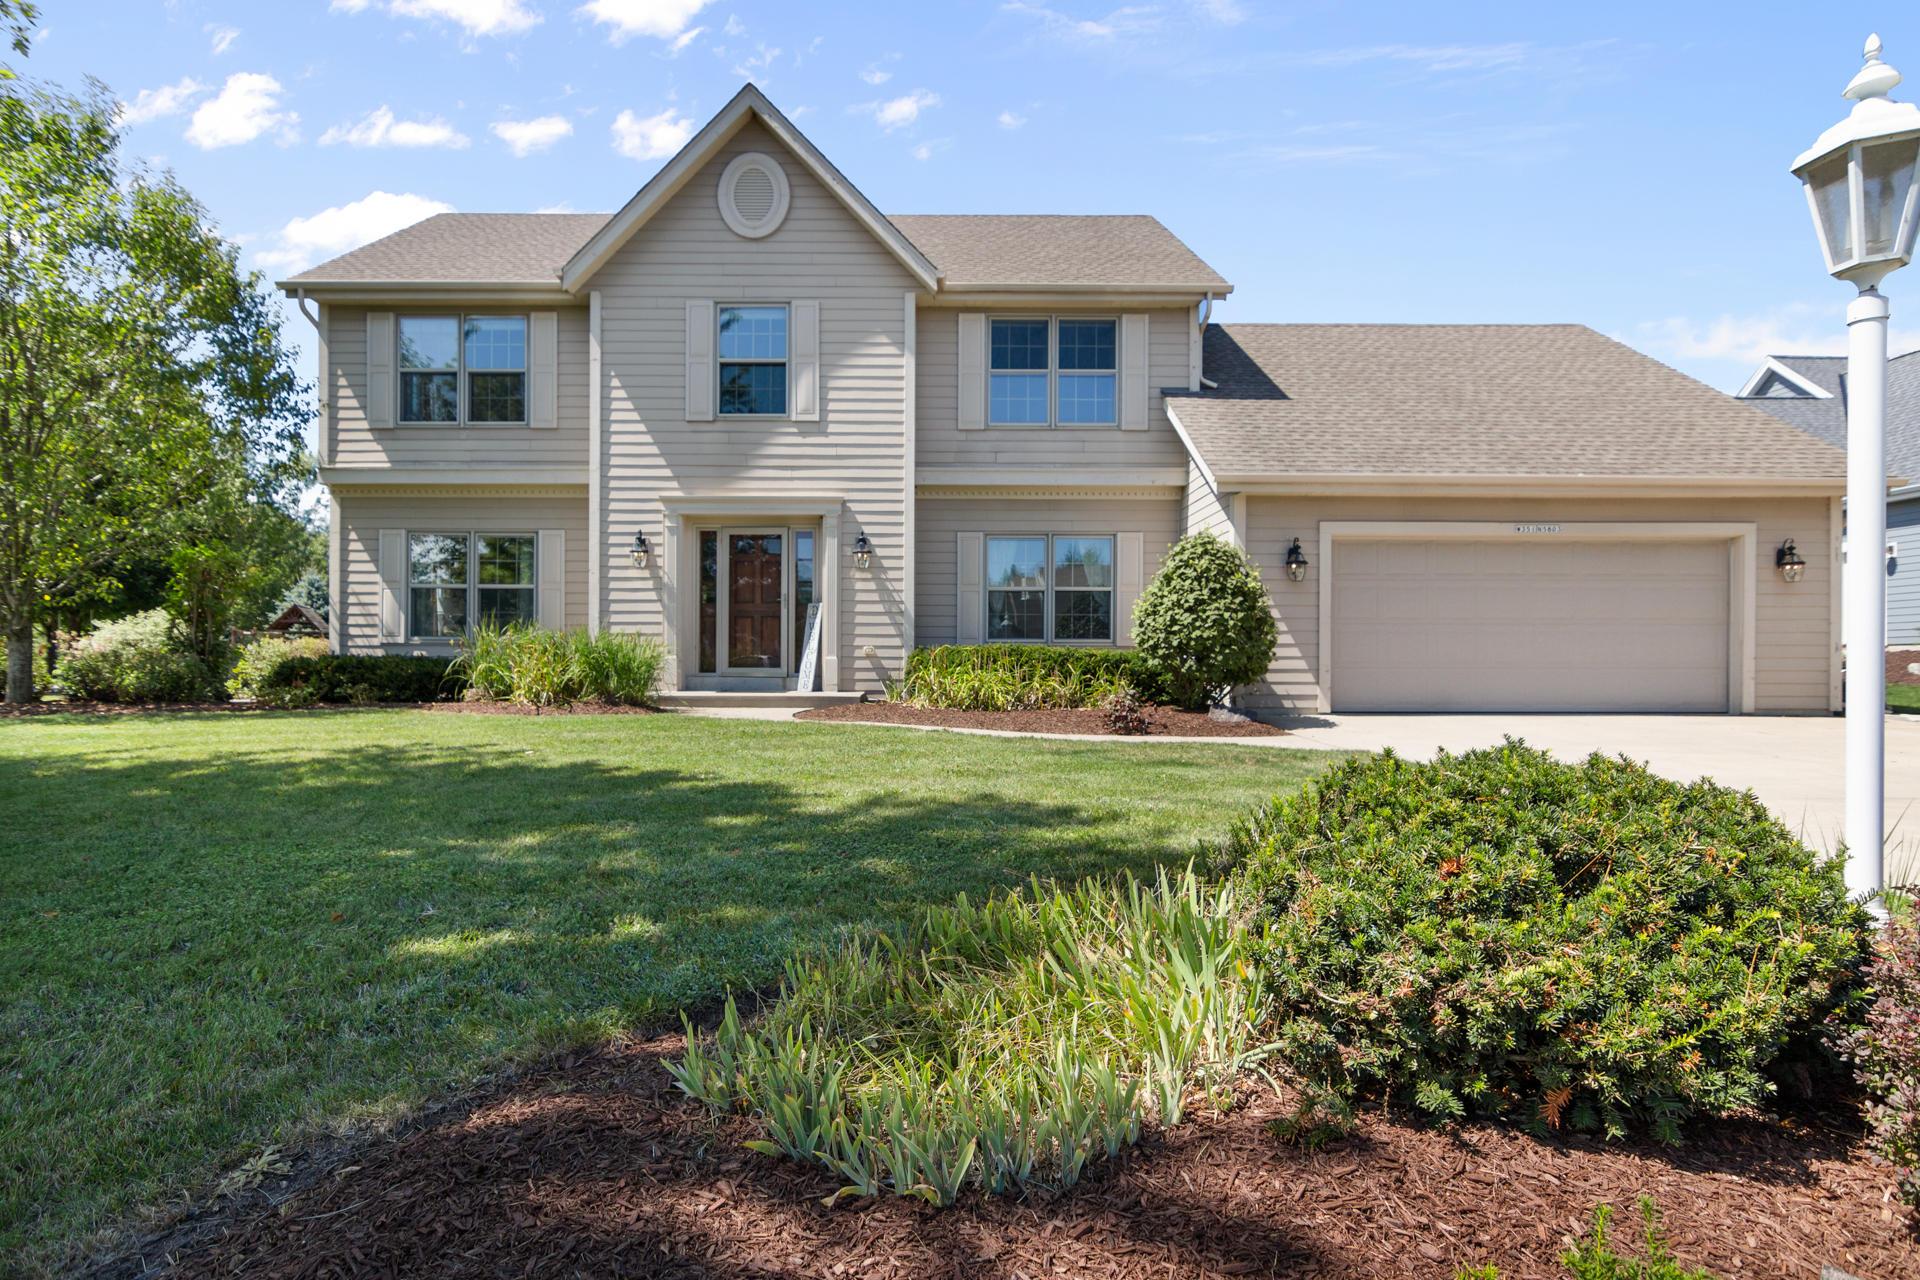 W351N5803 Westshore Rd, Oconomowoc, Wisconsin 53066, 4 Bedrooms Bedrooms, 8 Rooms Rooms,2 BathroomsBathrooms,Single-Family,For Sale,Westshore Rd,1654742